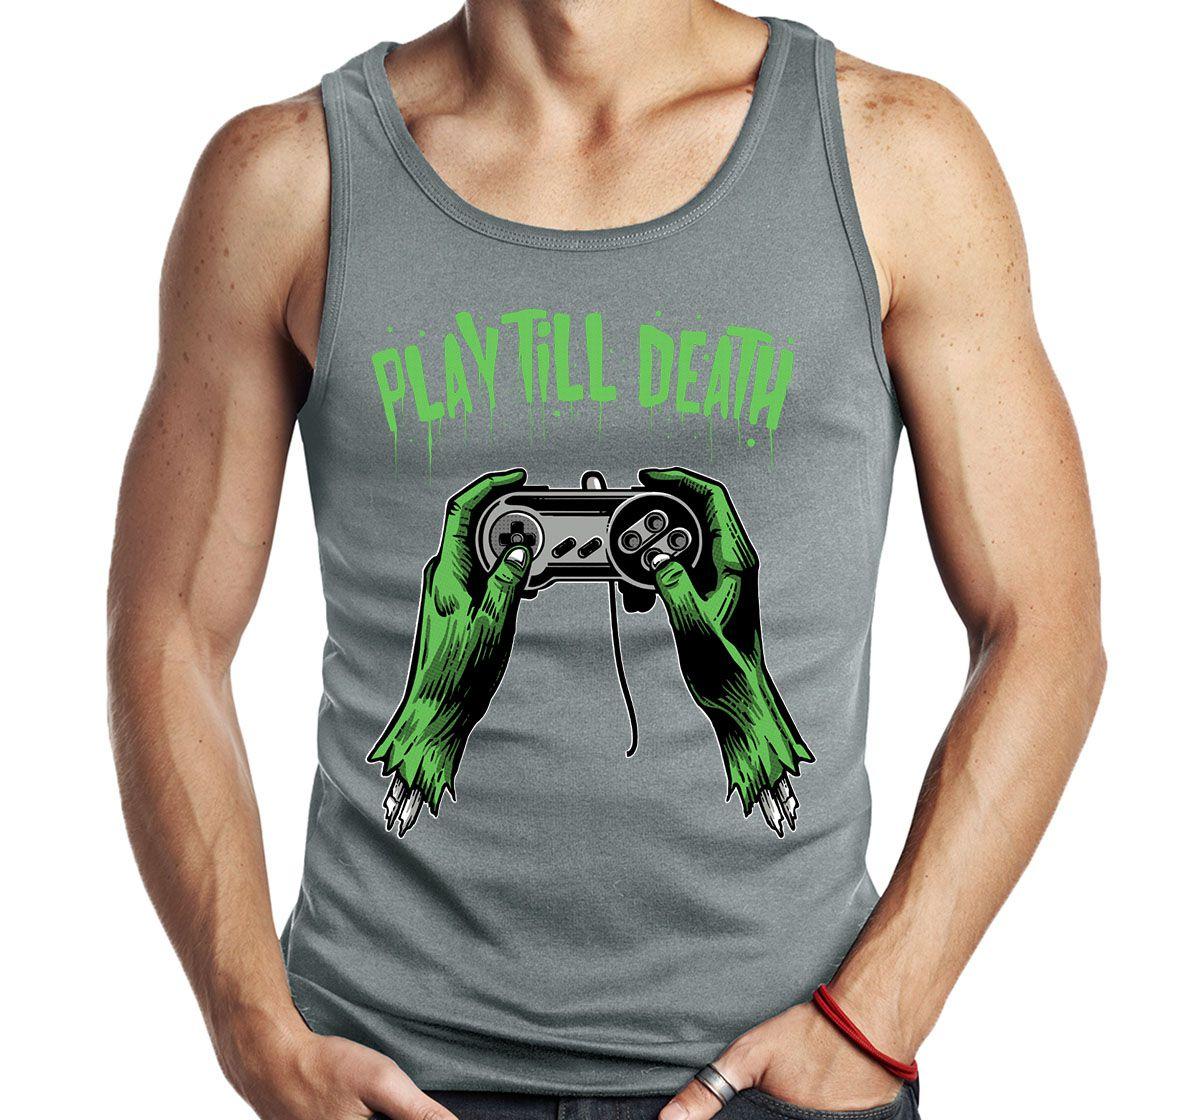 Camiseta Regata Geek Play till Death Video Game   - Dragon Store